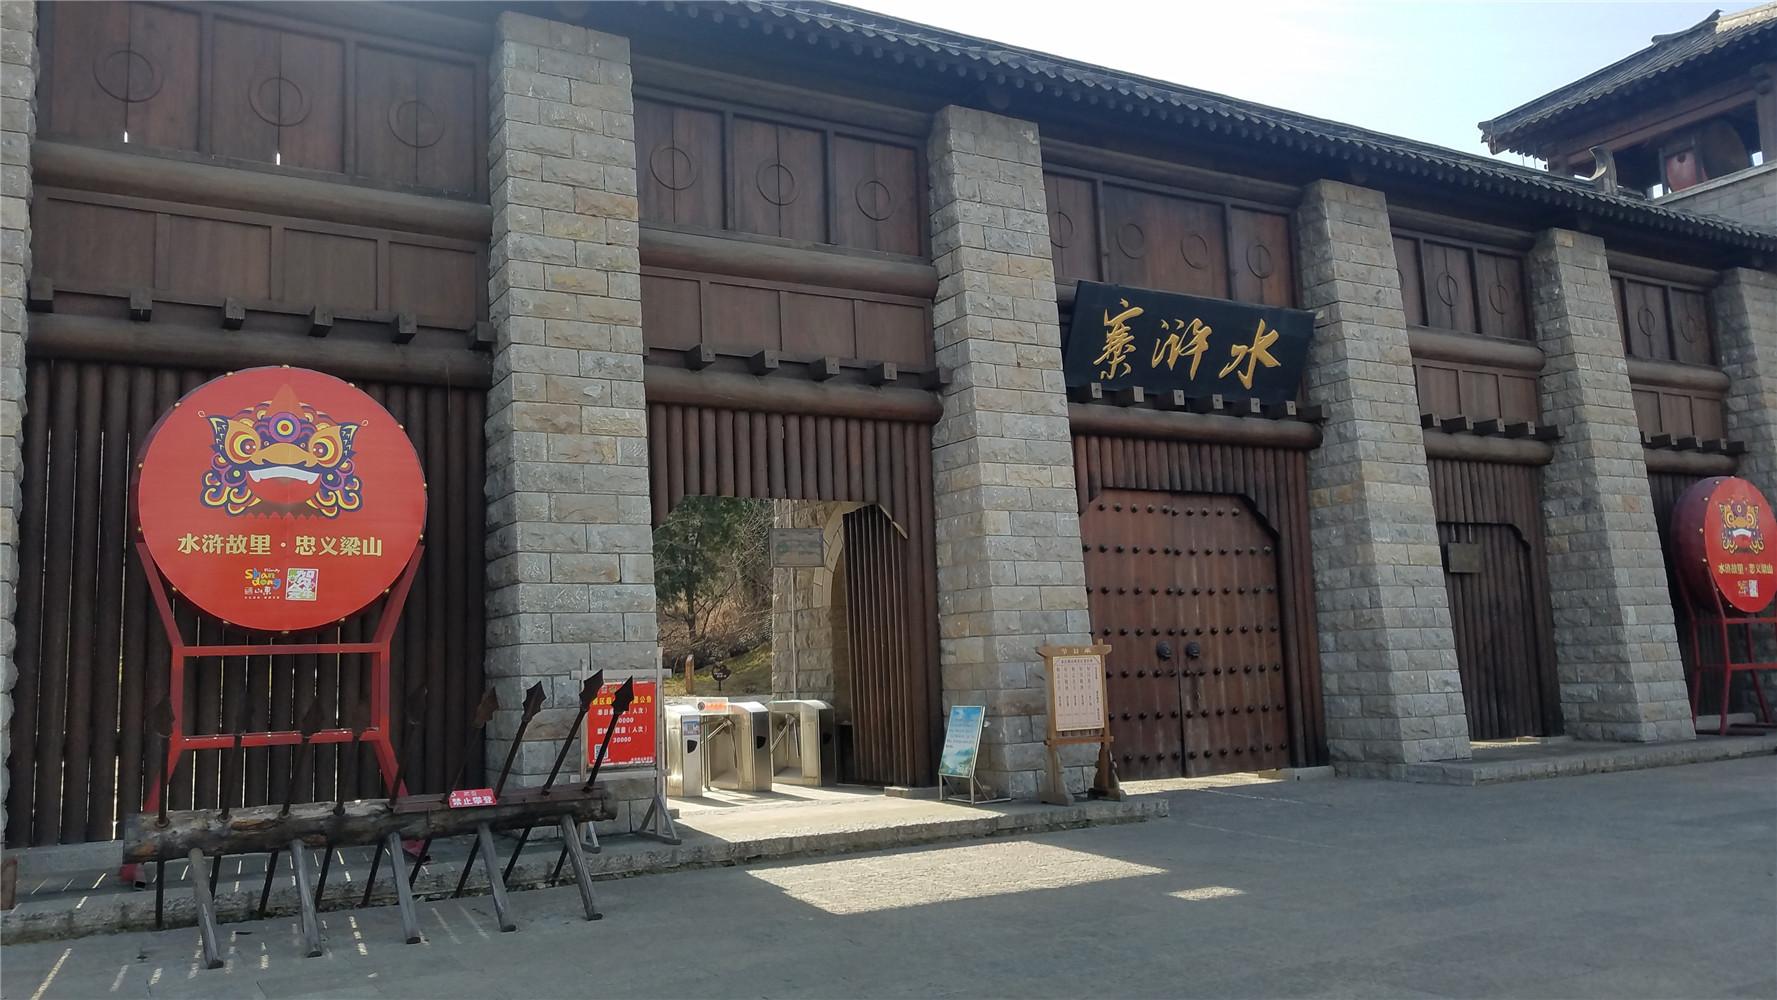 Shuibo Liangshan Scenic Area